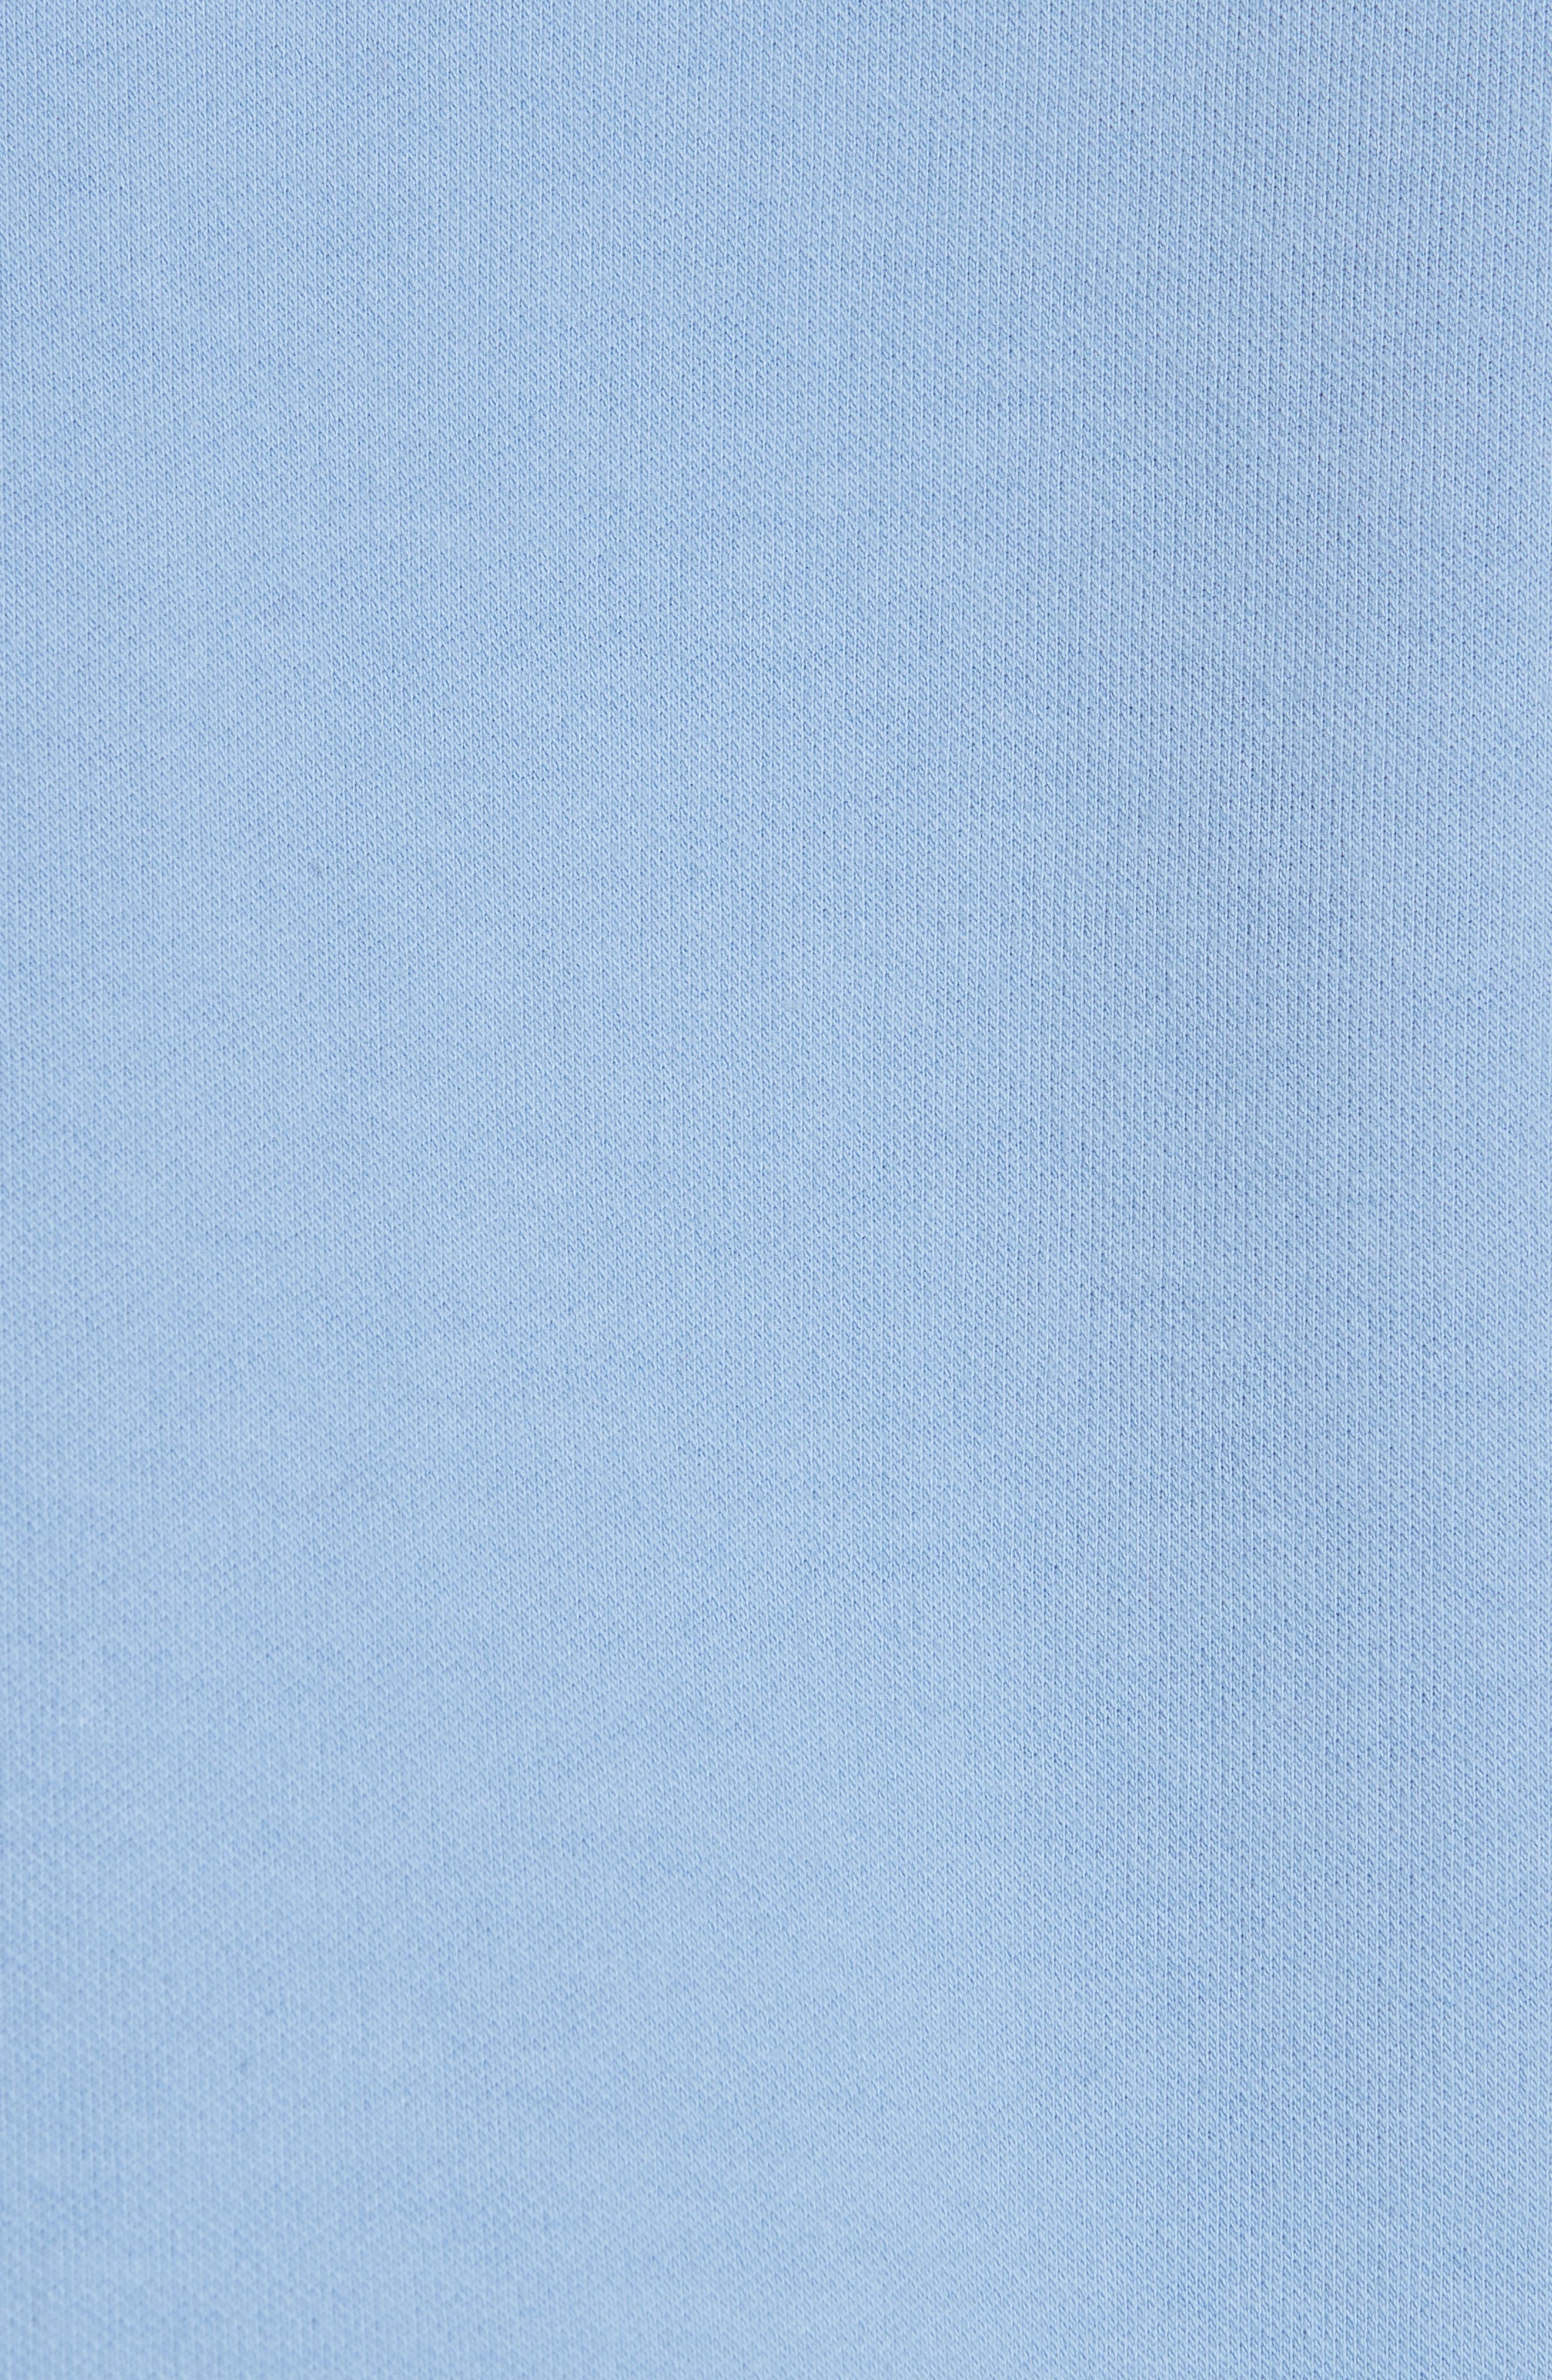 Asymmetrical Mixed Media Sweatshirt,                             Alternate thumbnail 5, color,                             LIGHT BLUE/ WHITE